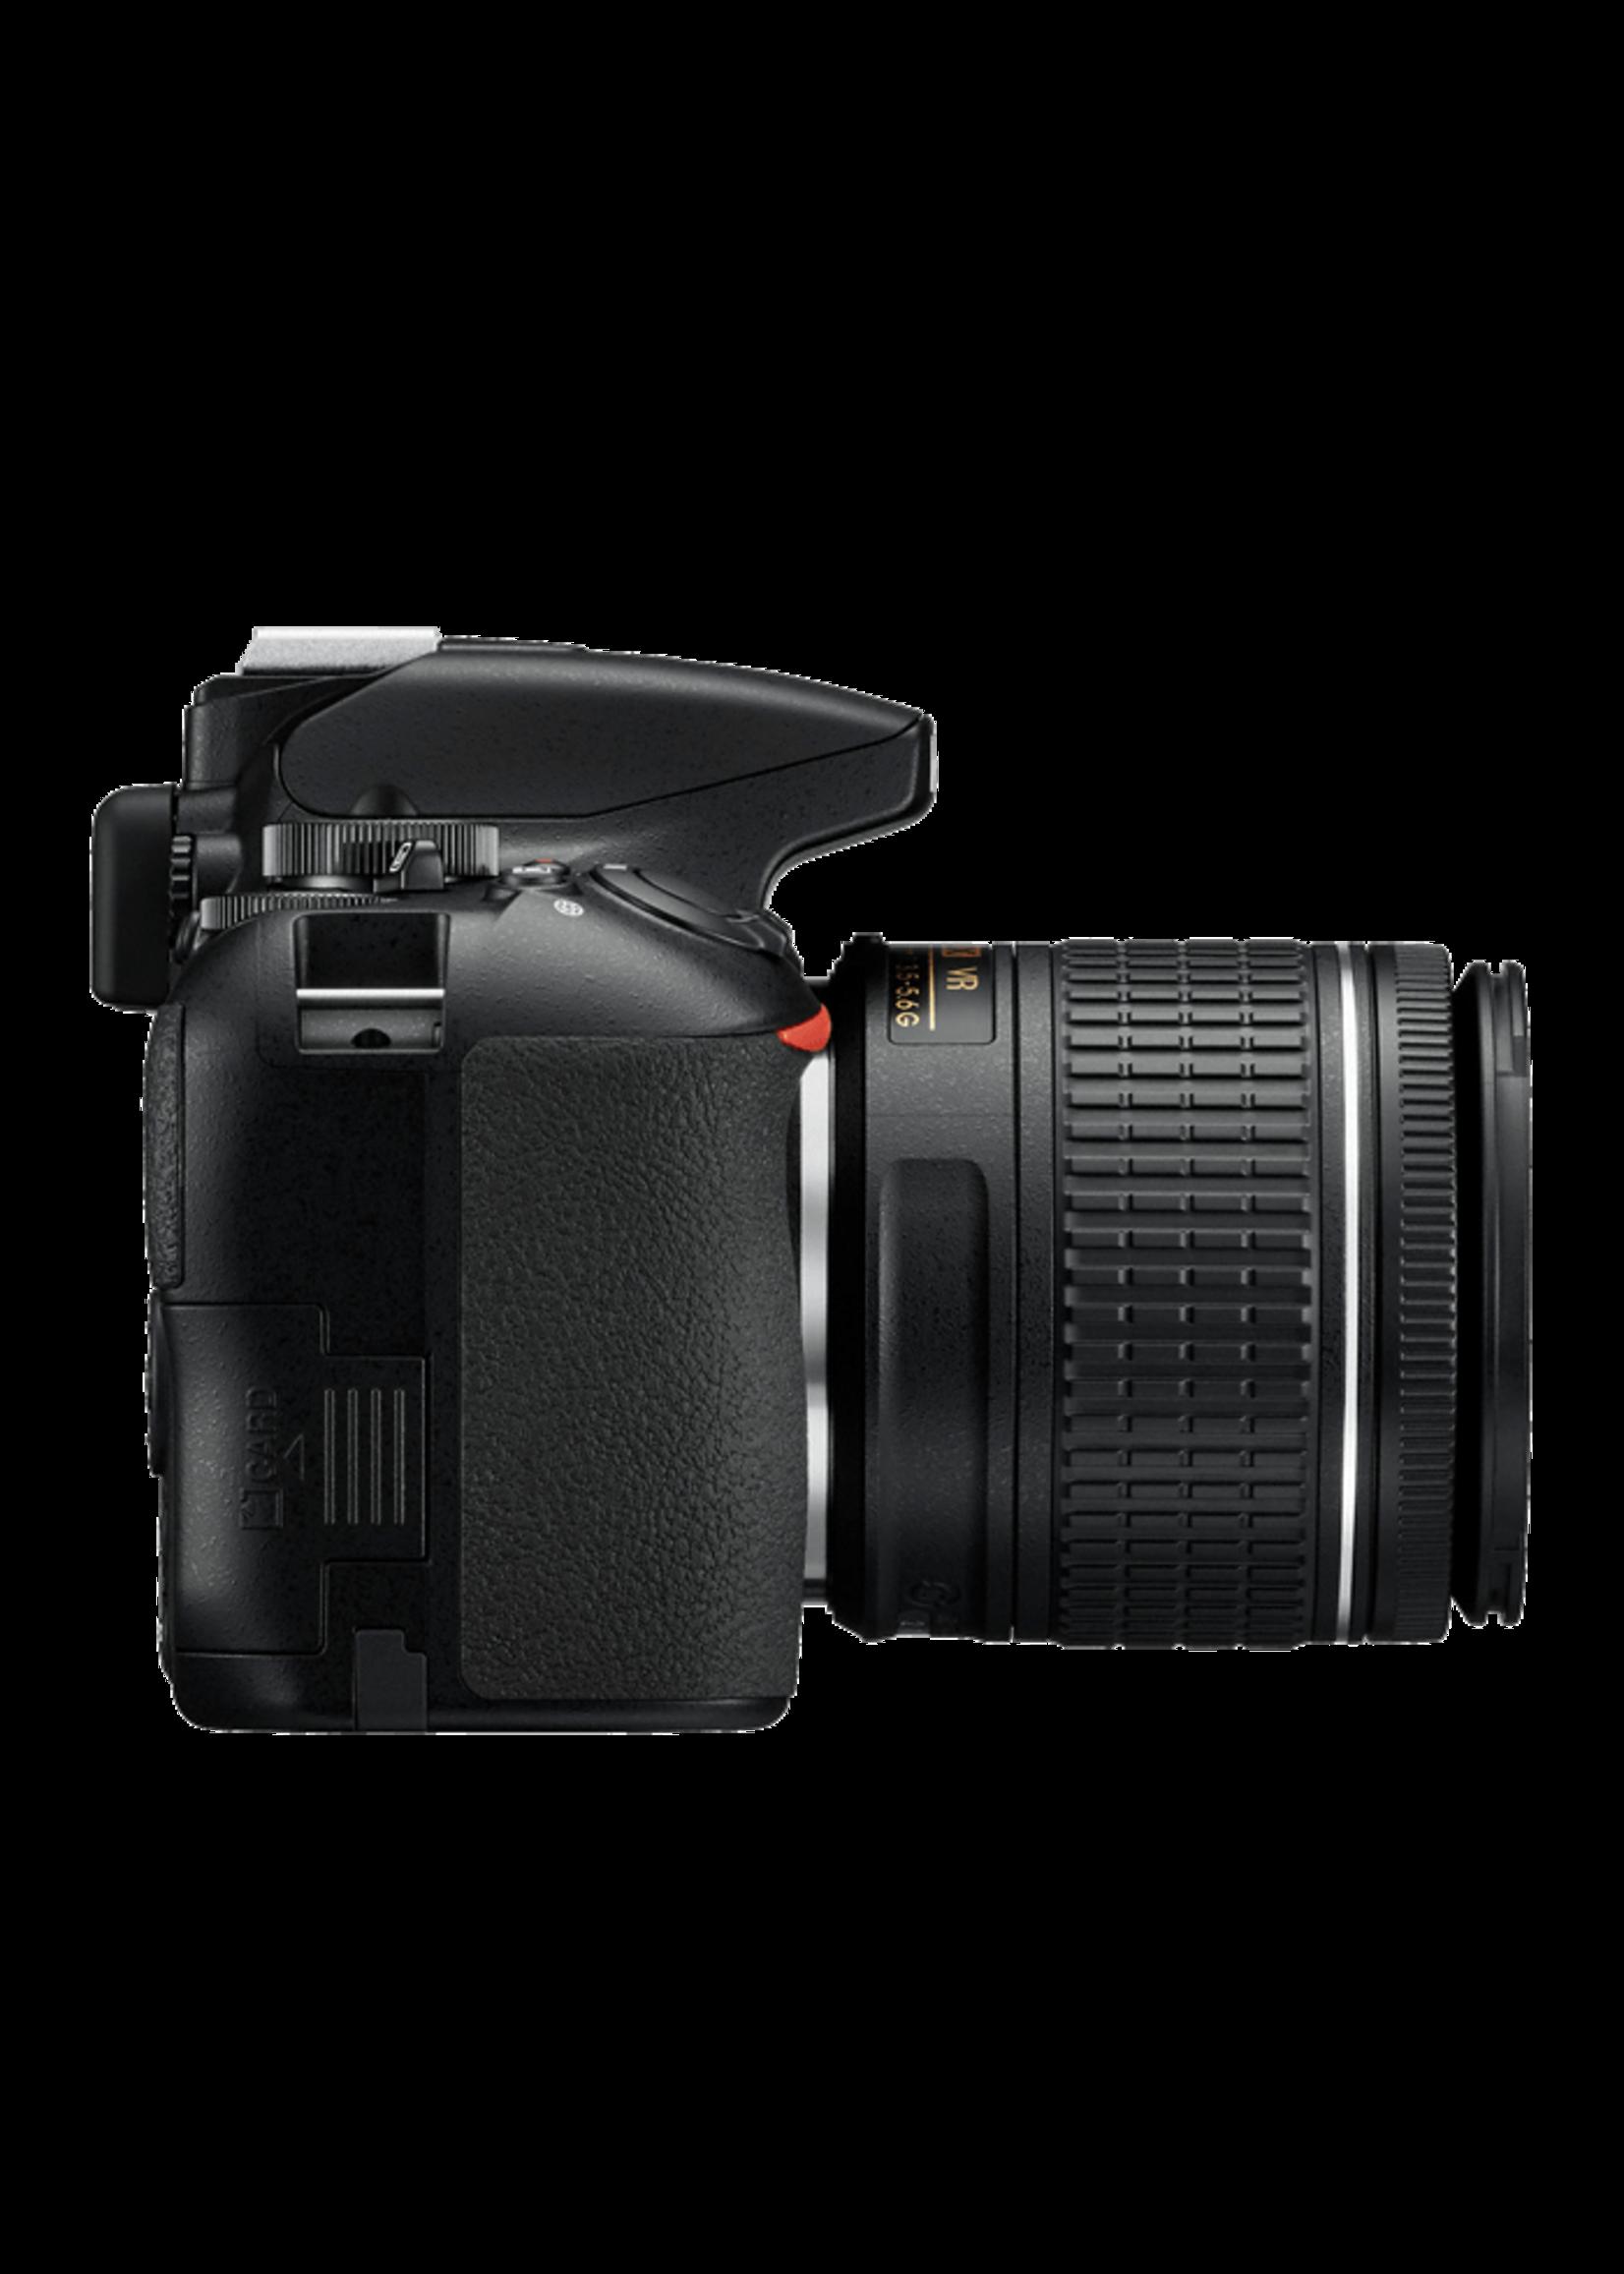 Nikon inc D3500 with 18-55 F/3.5-5.6G VR